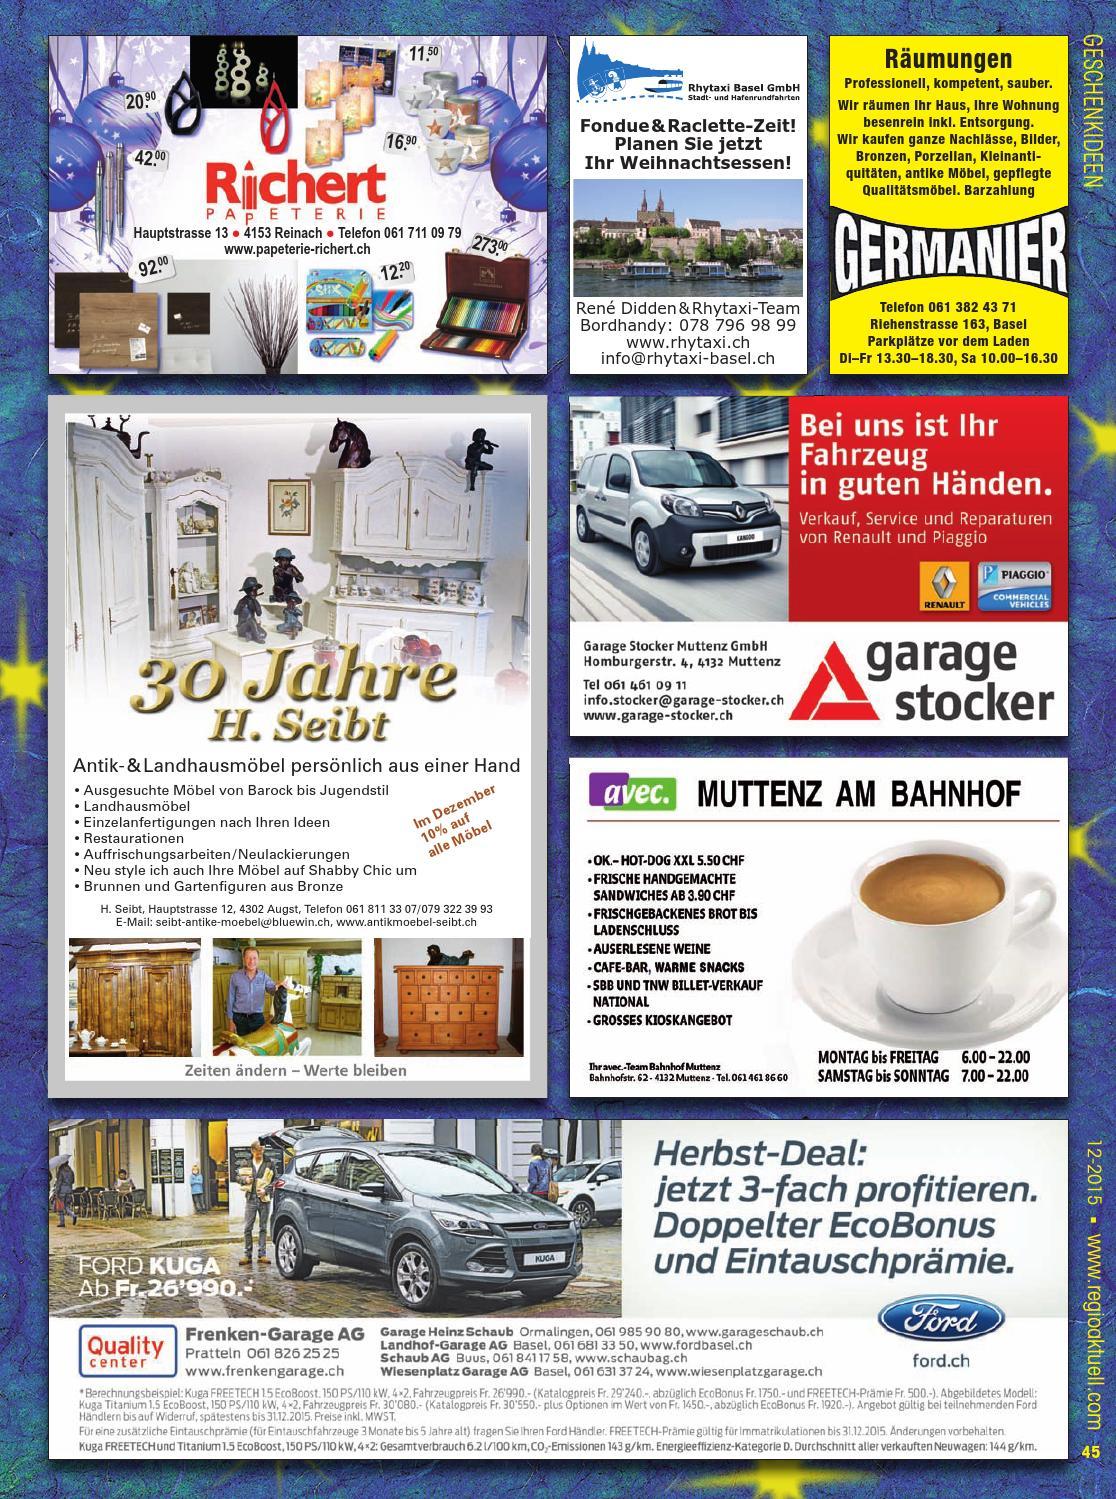 Niedlich Landhausmöbel Katalog Bilder - Hauptinnenideen - kakados.com